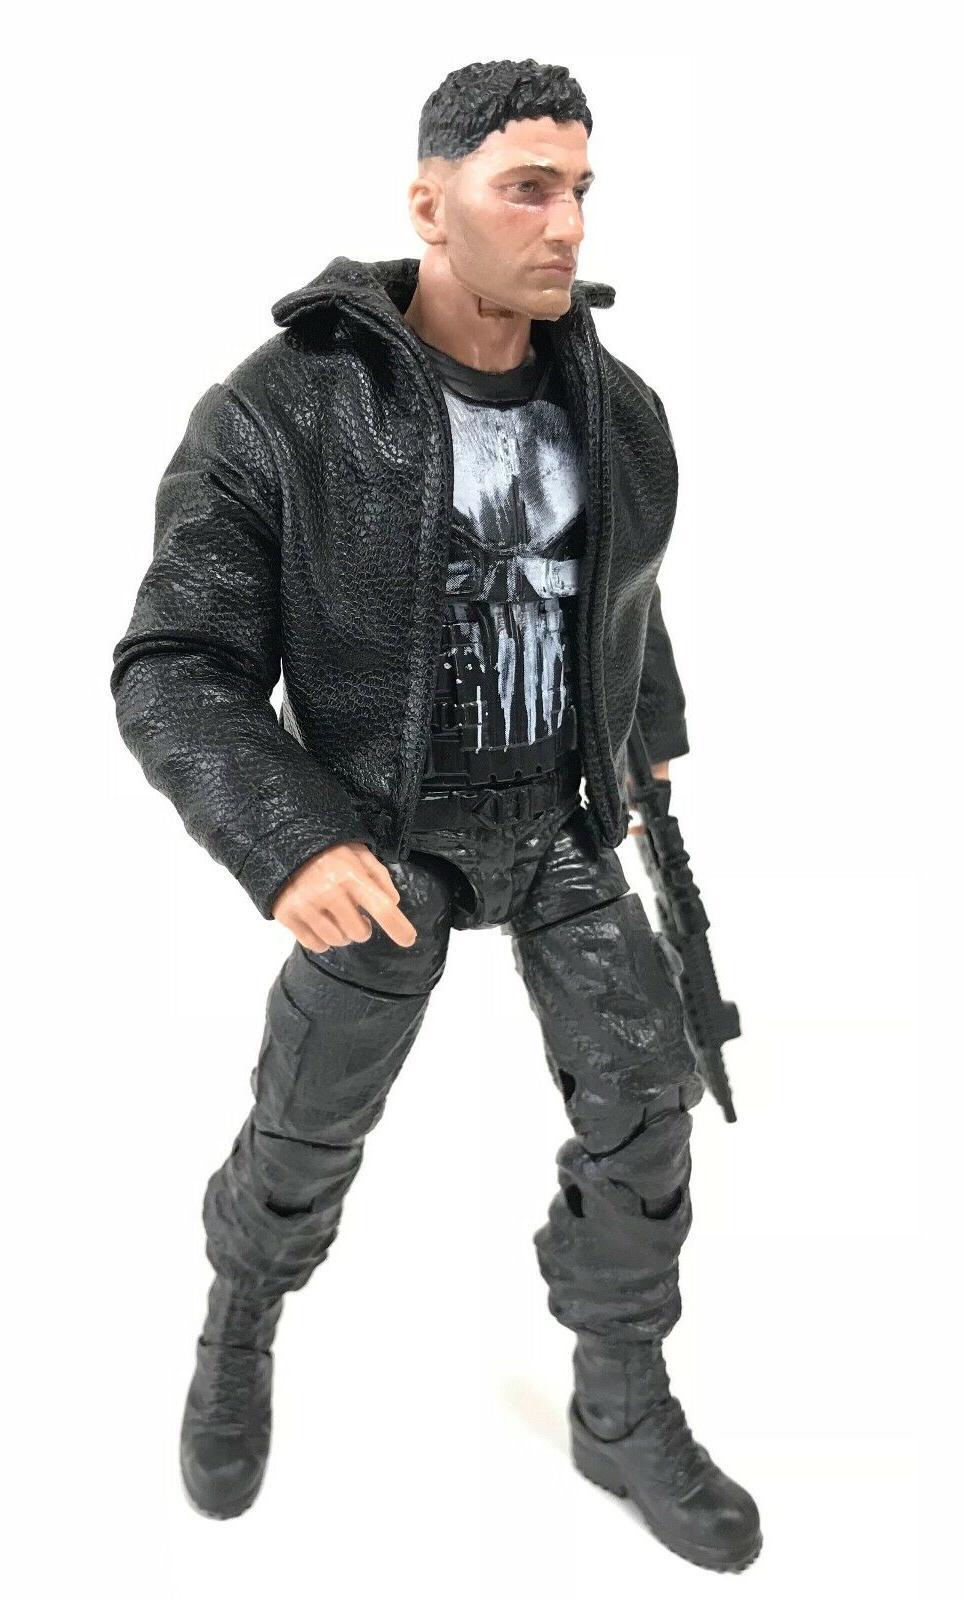 SU-JKM1-BK: Black Jacket for Legends Mezco